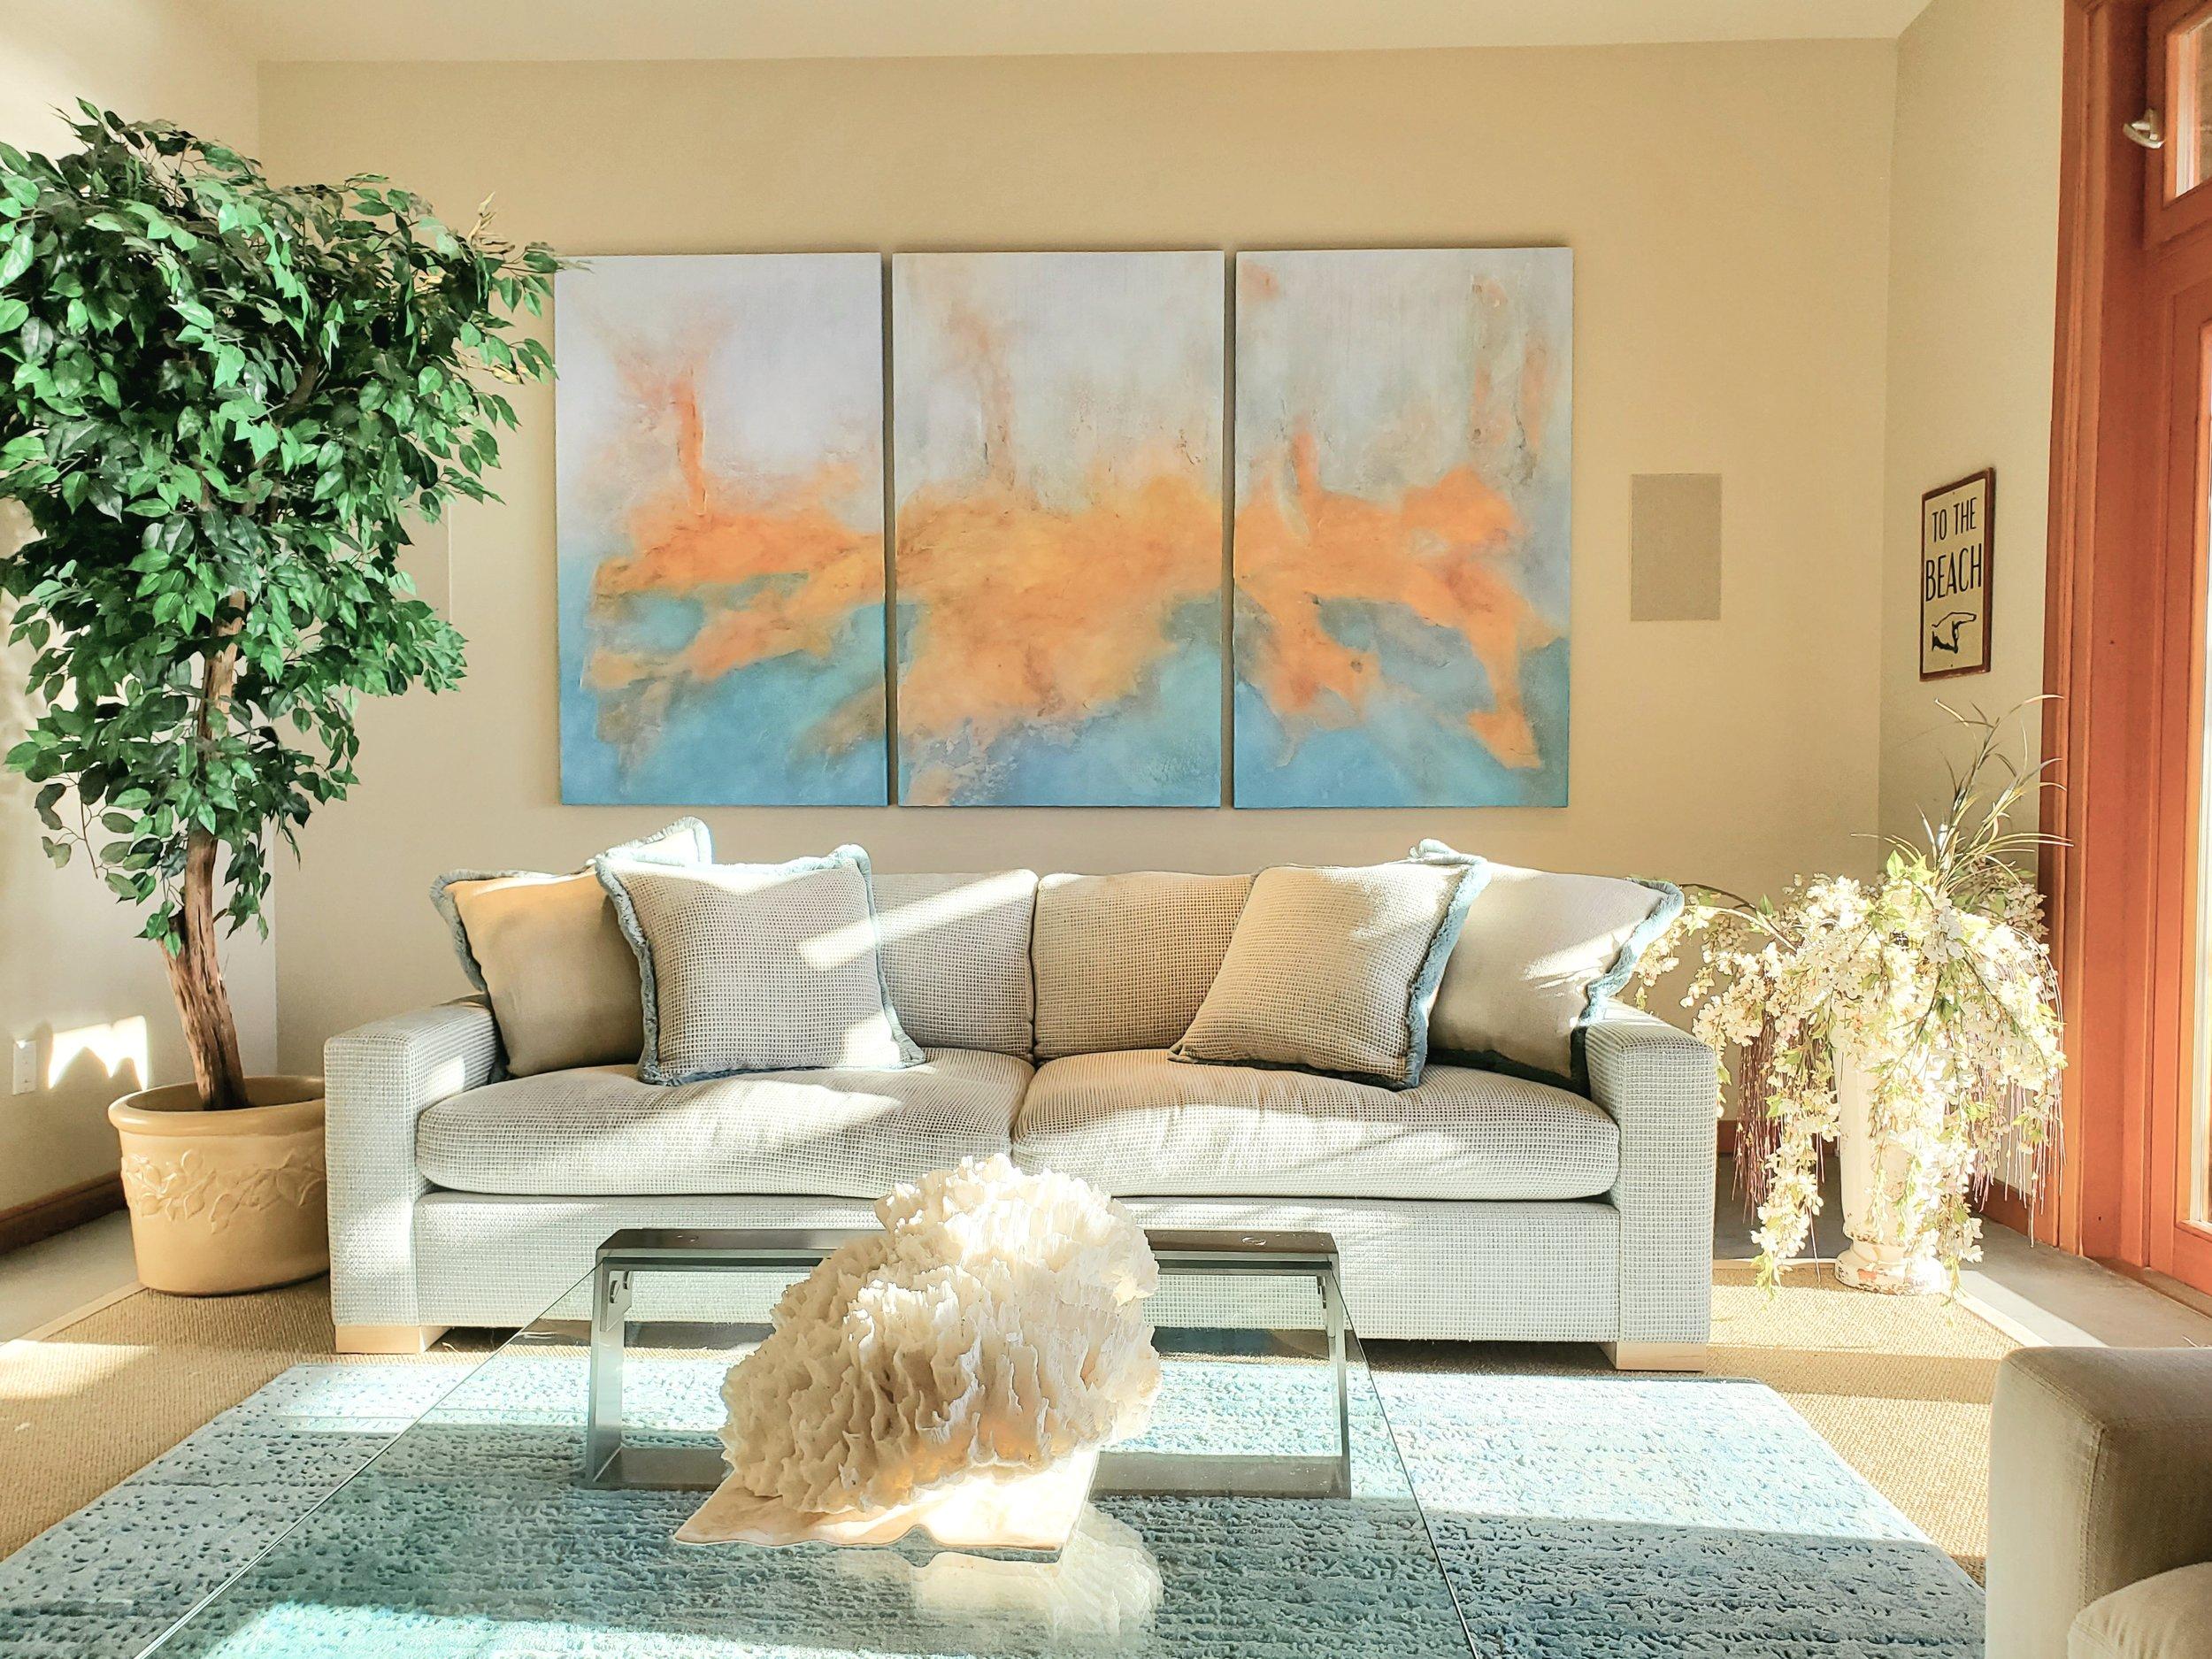 Donna Giraud Installed 26